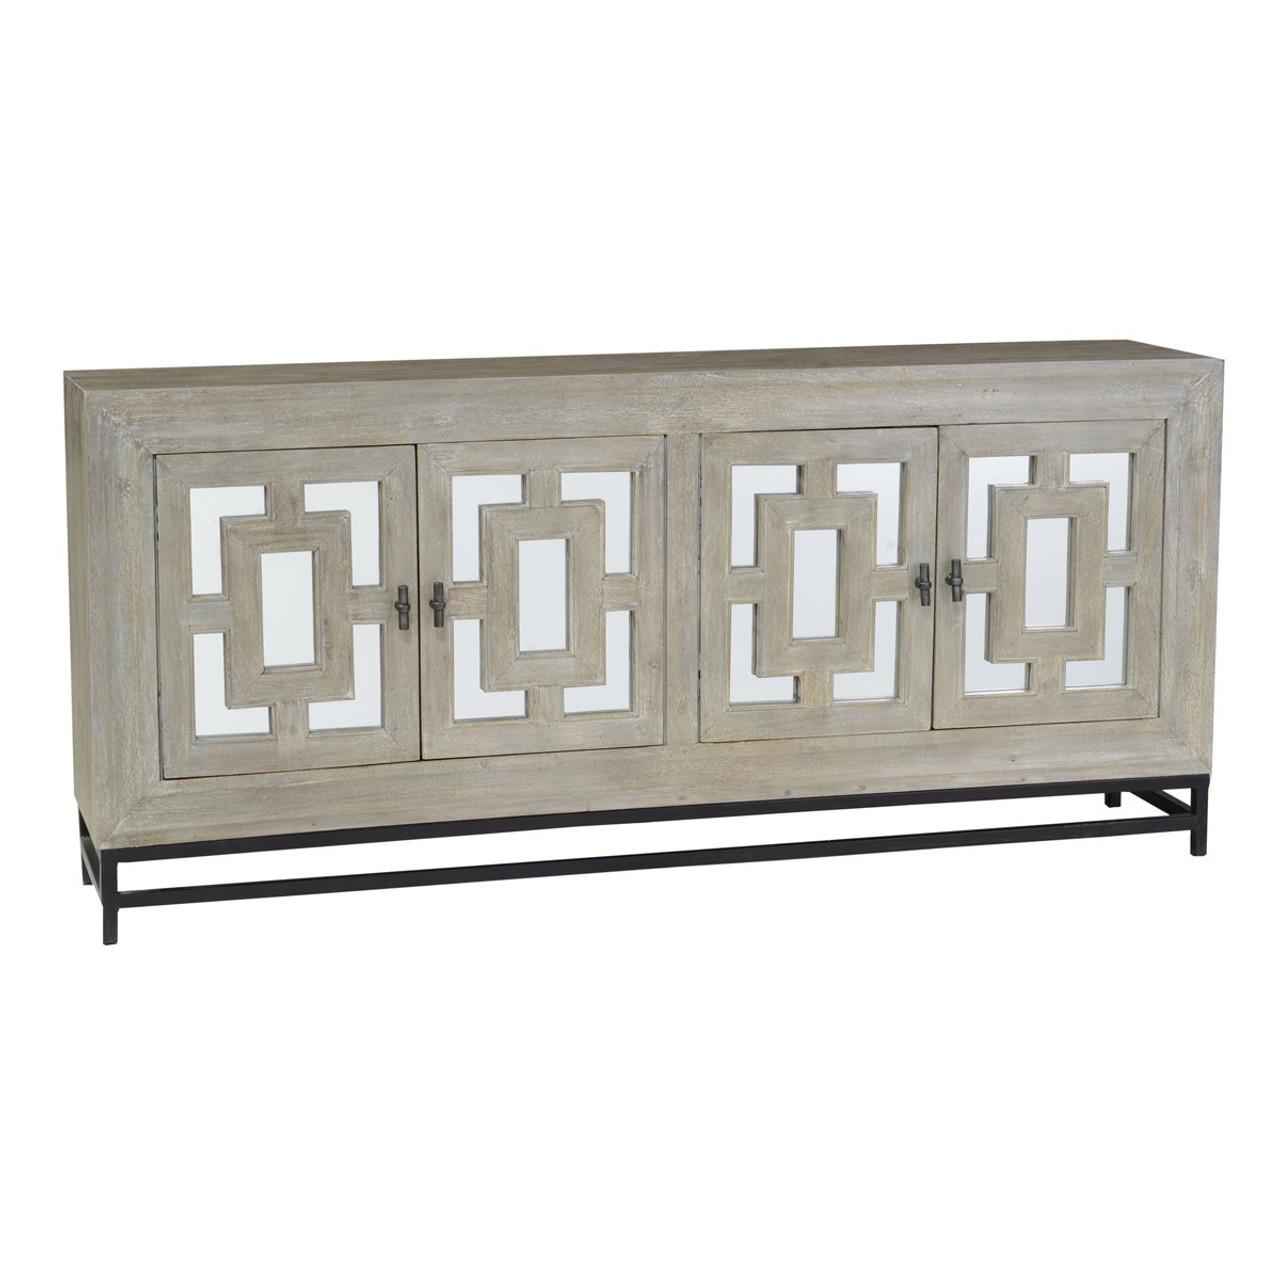 Perfect Marabella 4 Door Mirrored Wood Buffet Sideboard | Zin Home HR44